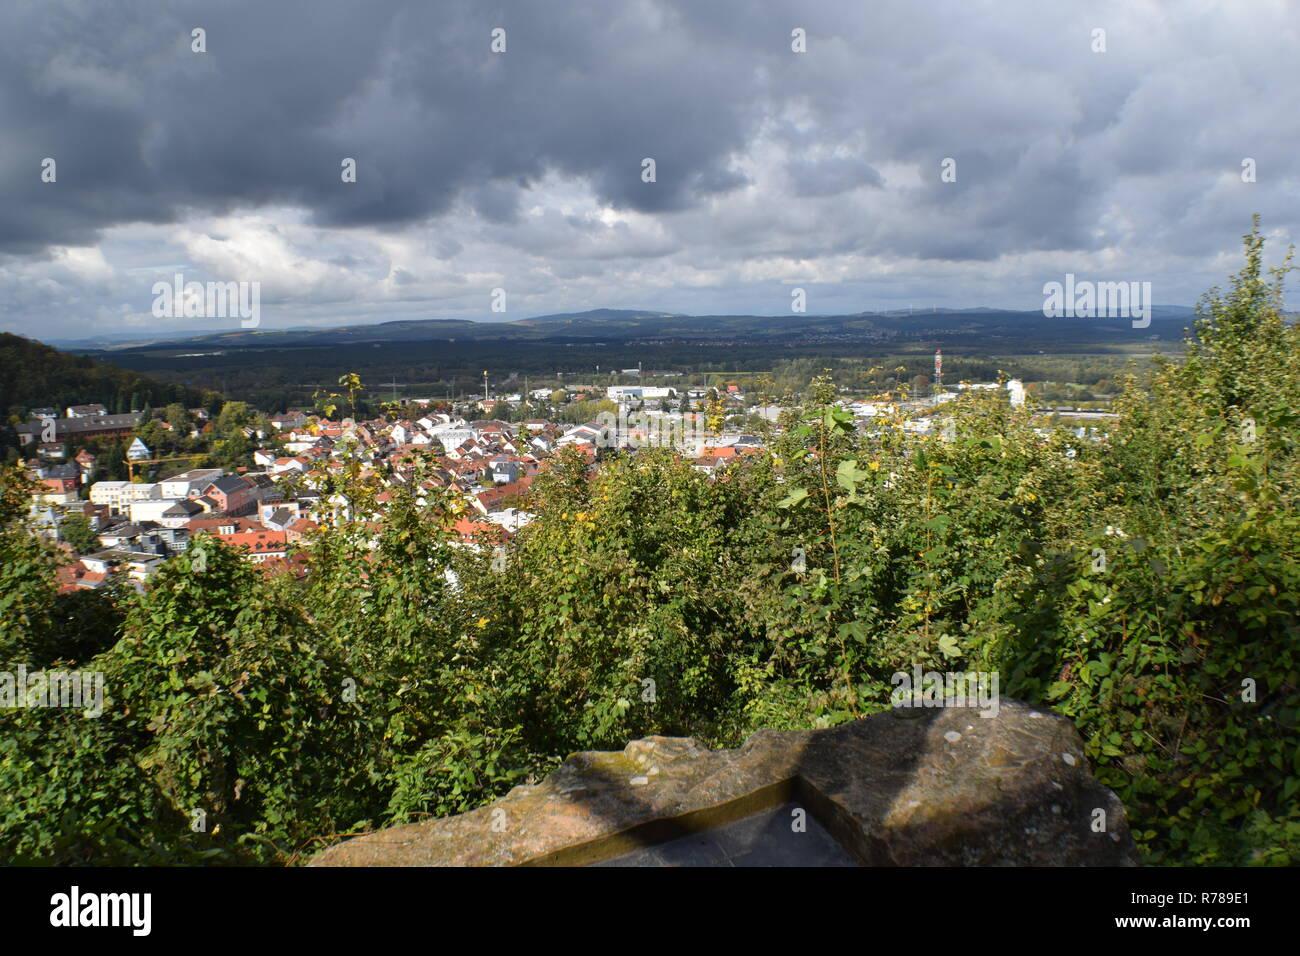 Blick auf Landstuhl - Stock Image